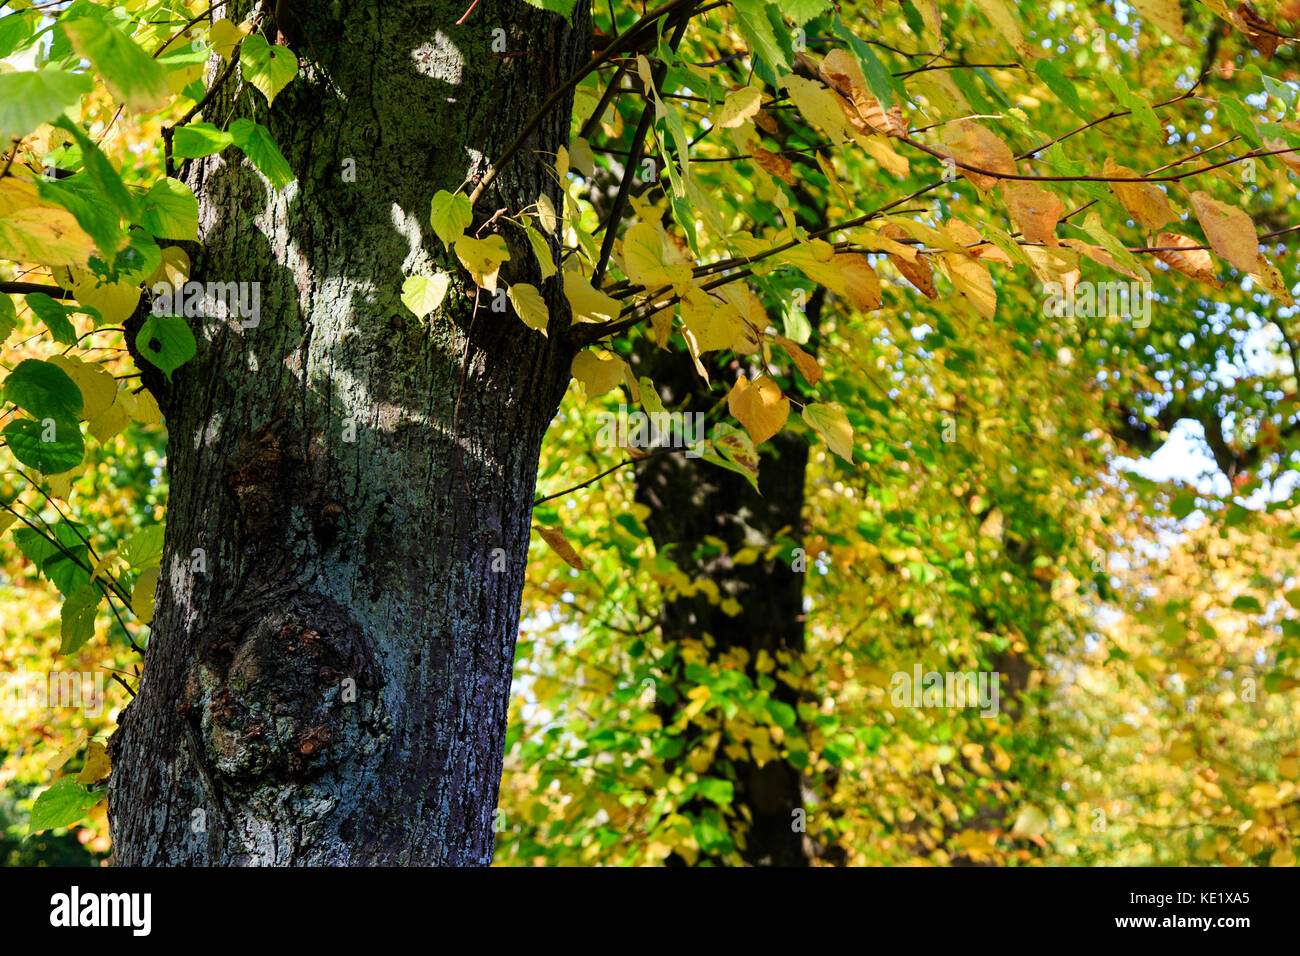 Yellow Autumn Leaves Linden Tree Stock Photos & Yellow Autumn Leaves ...